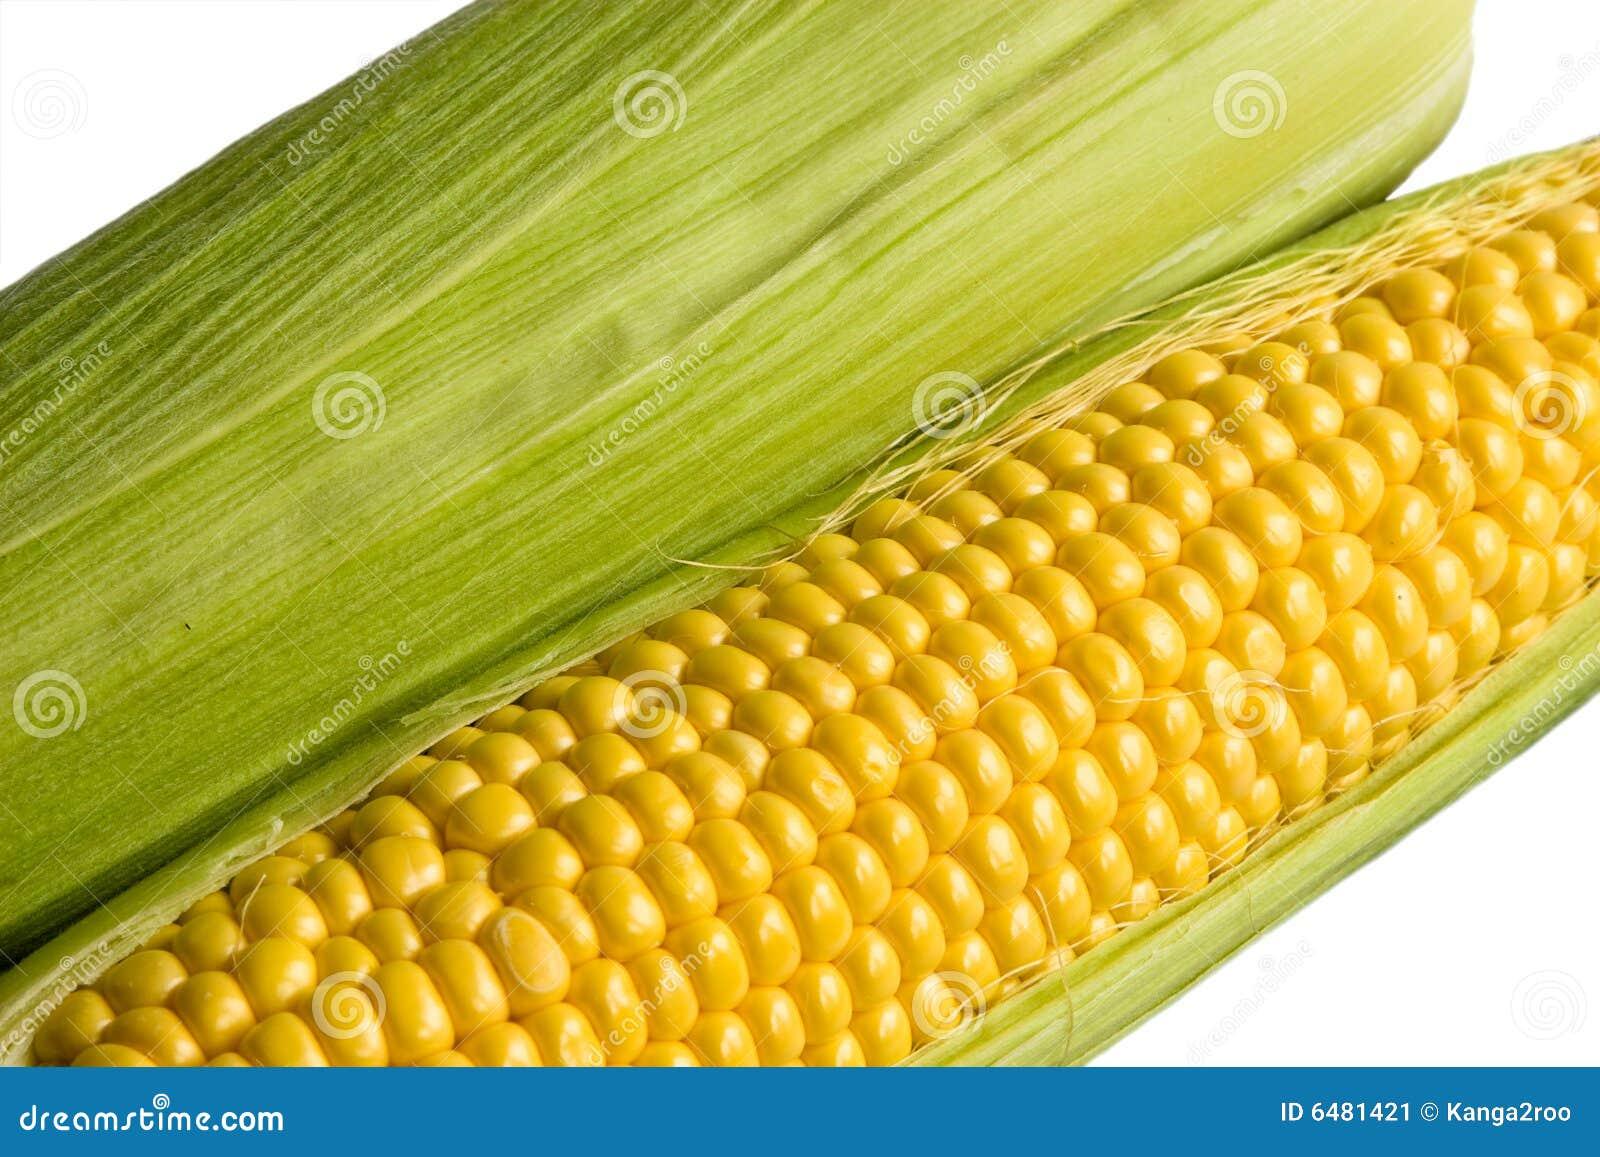 Kolby z kukurydzy